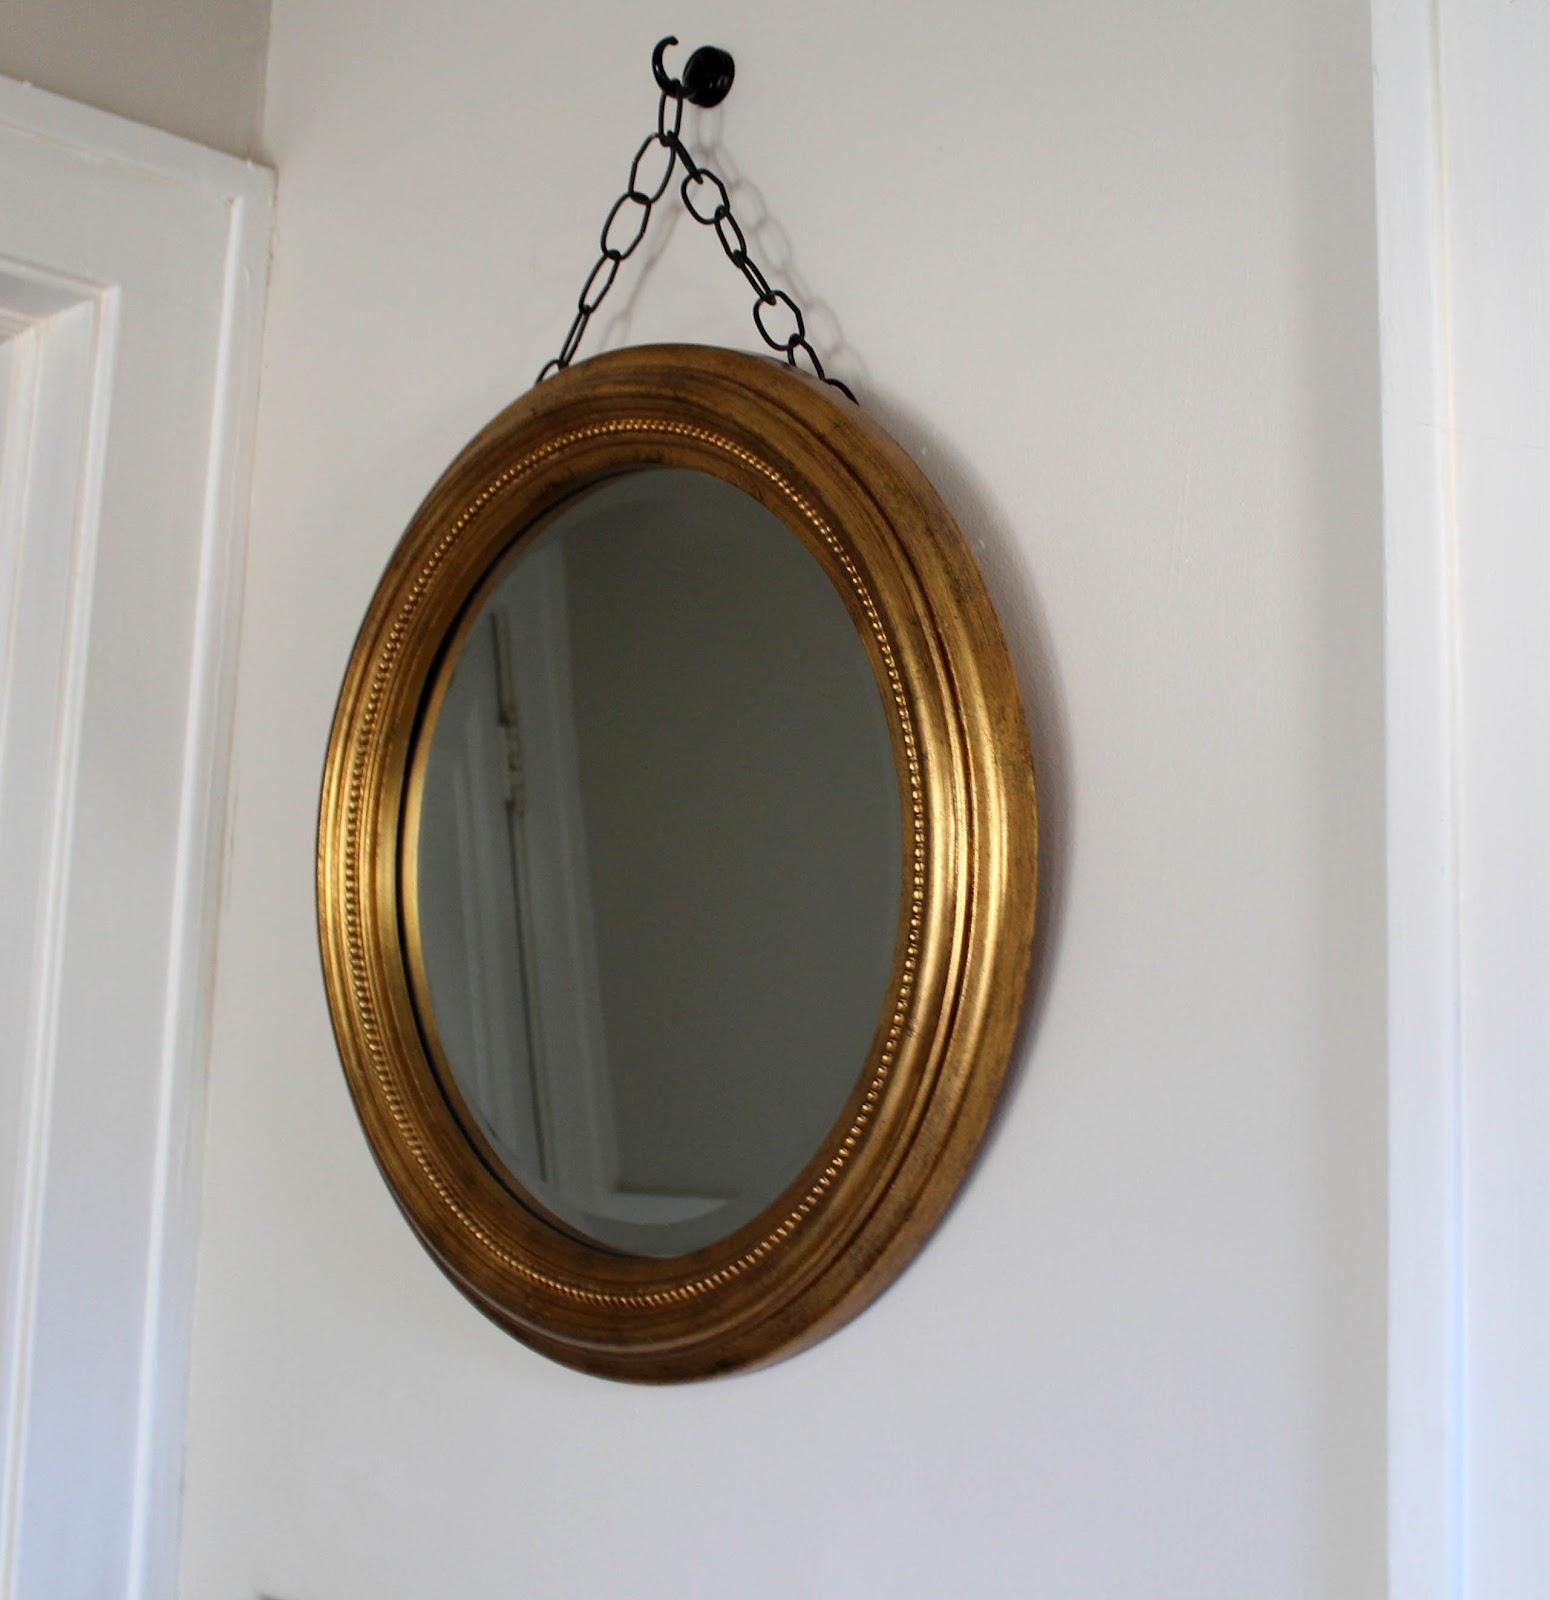 Hanging Wall Mirrors Hooks